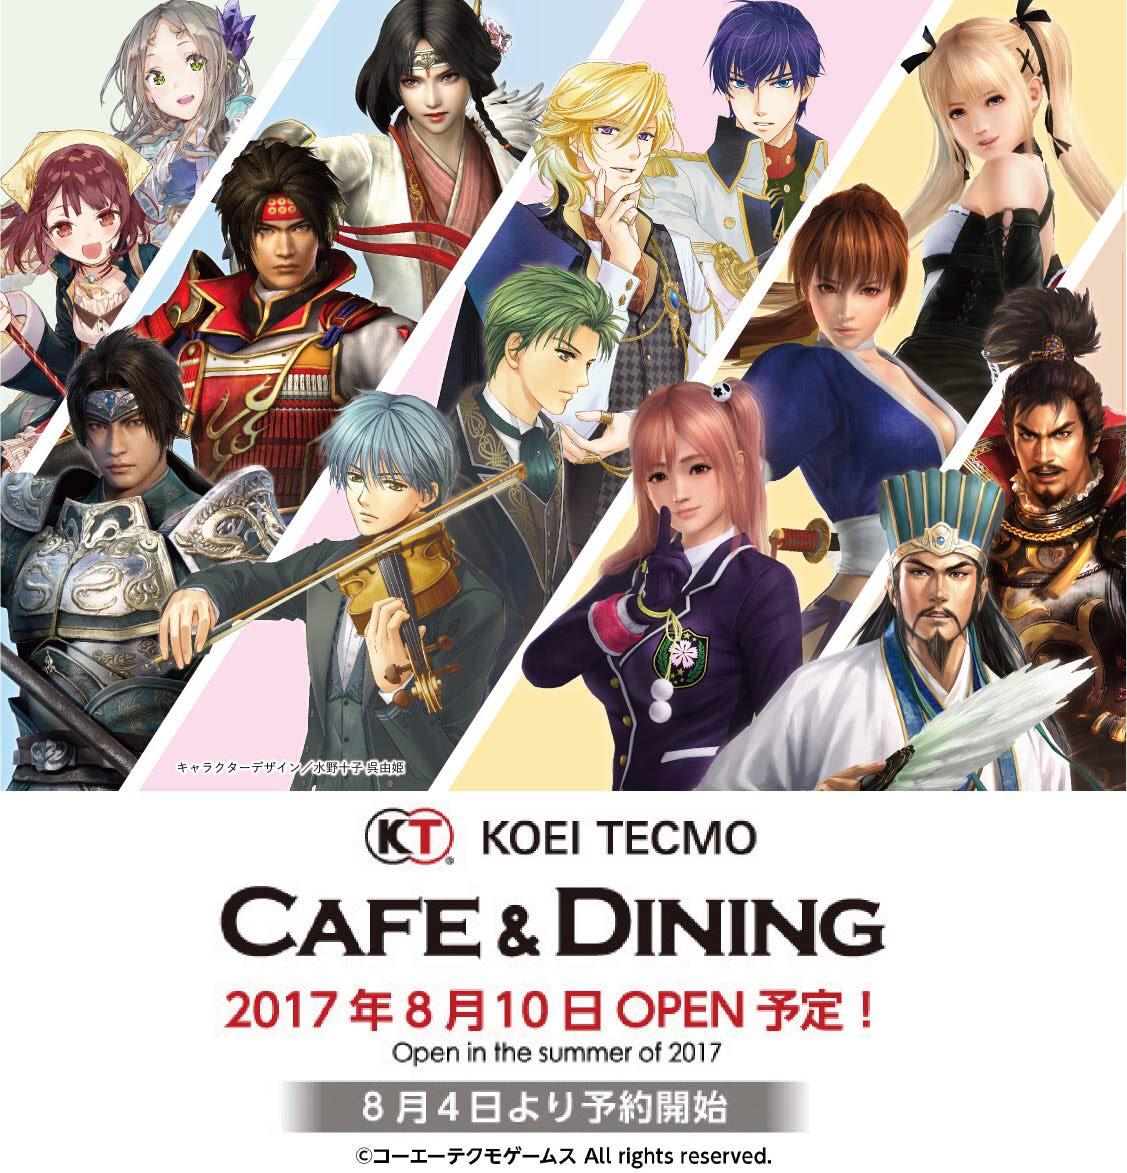 《KOEI TECMO CAFE & DINING》新情報!オープン日が8月10日(木)に決定!また、最初の期間